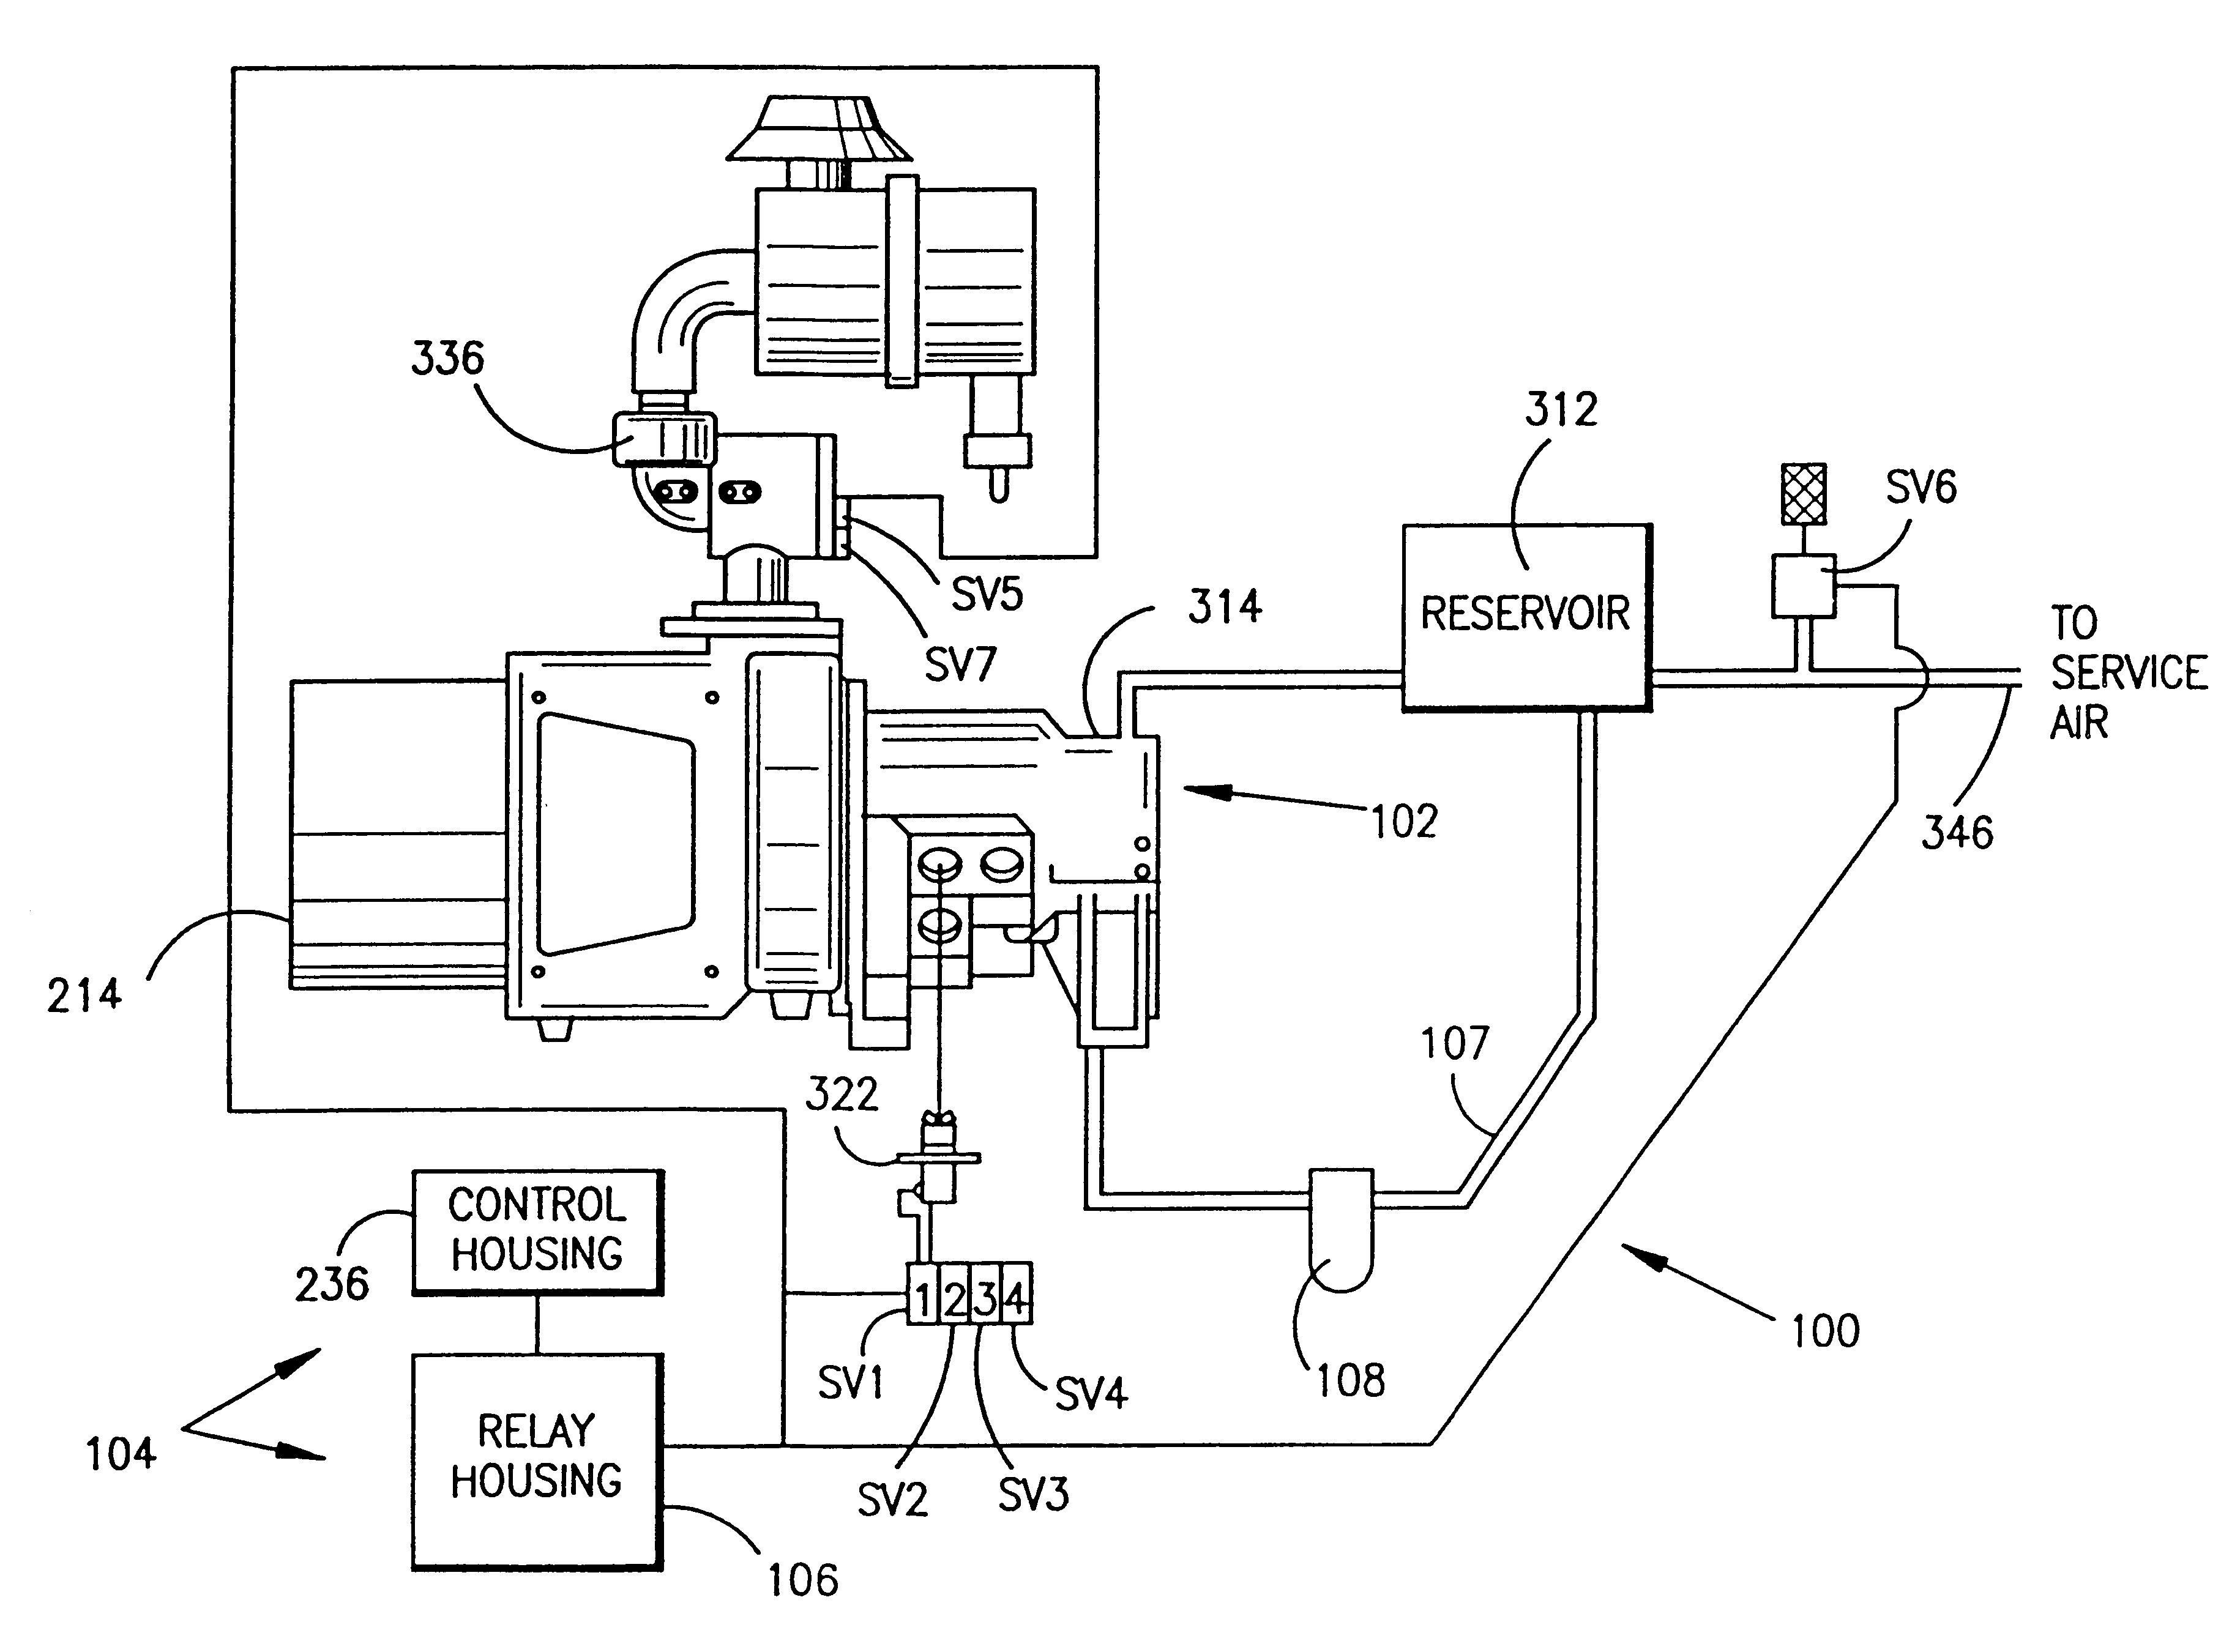 ... Ridgid Air pressor Wiring besides Sullair Parts Diagram also Ingersoll  Rand 185 Cfm Air pressor Wiring